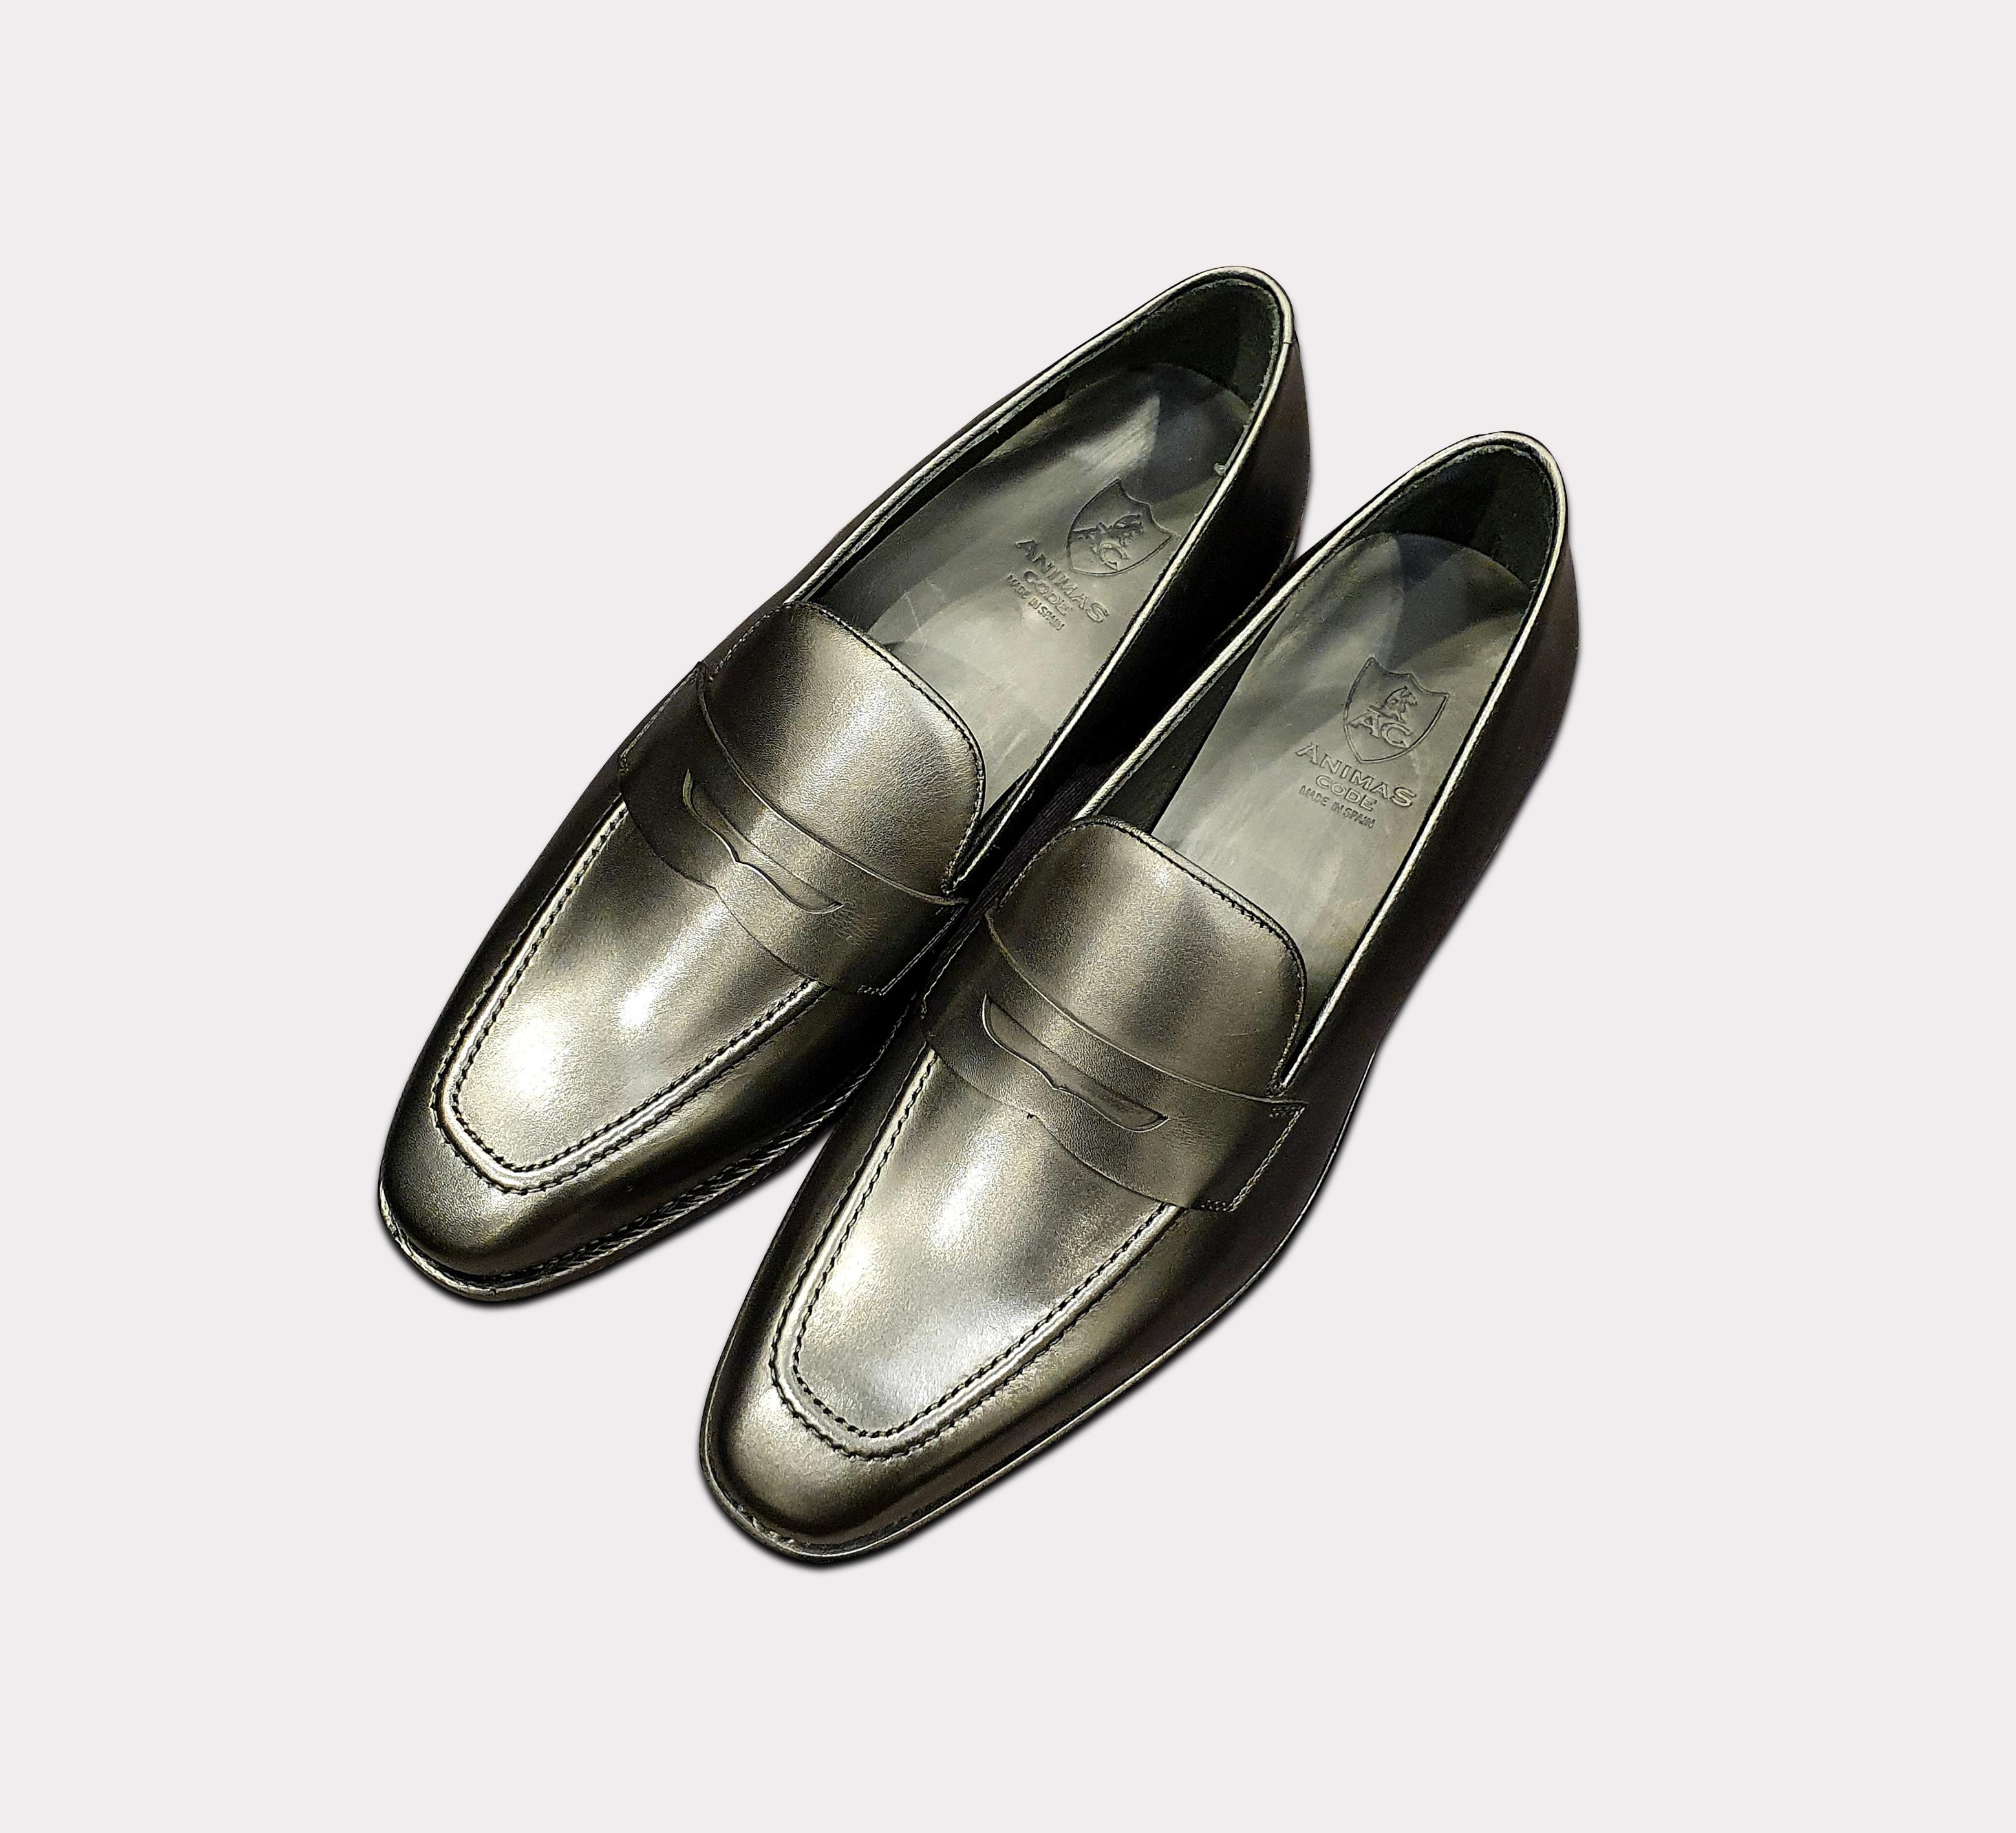 70398 Penny loafer - Savile